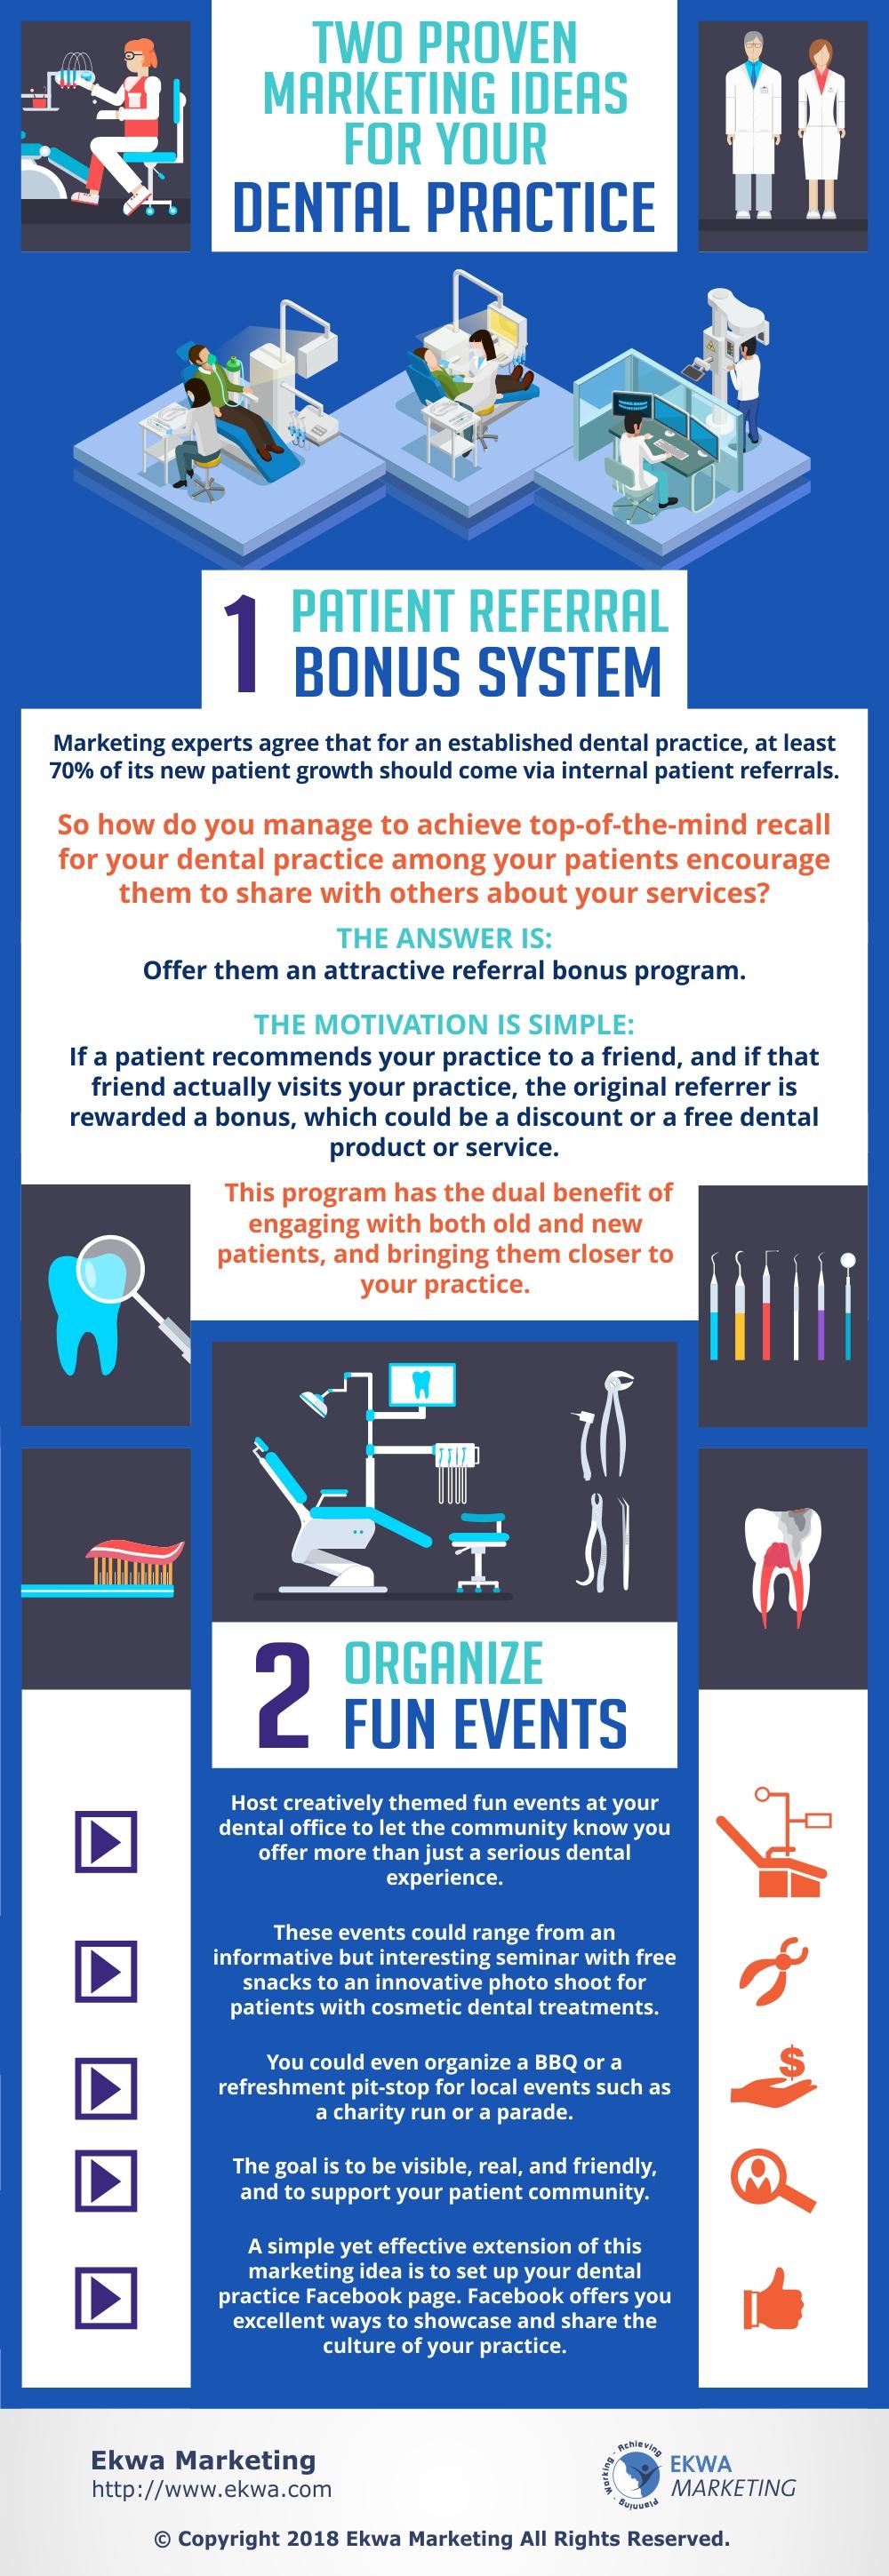 Marketing Ideas for Dental Practice